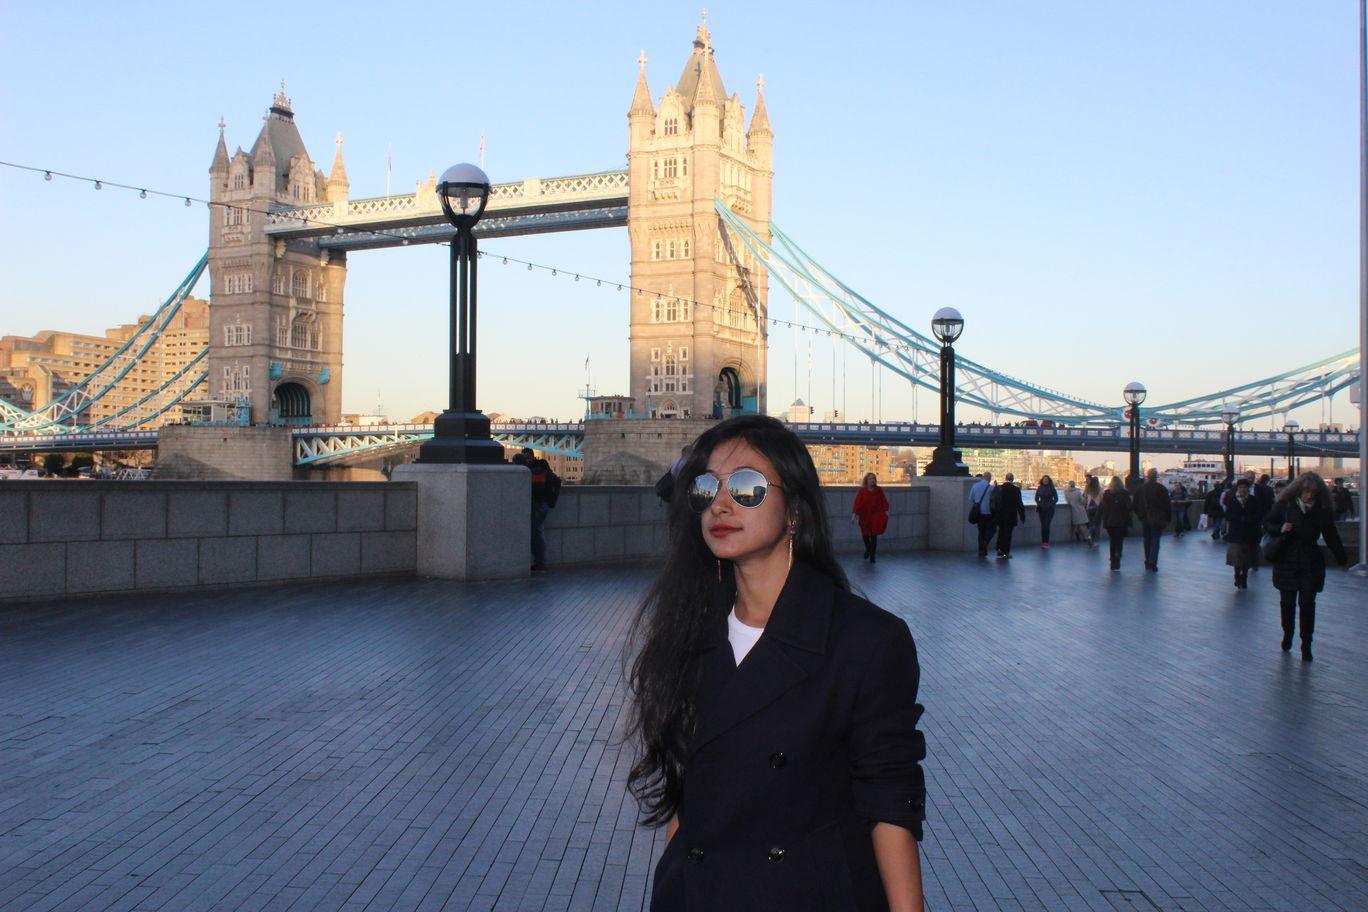 Photo of London By Shesokti Samapika